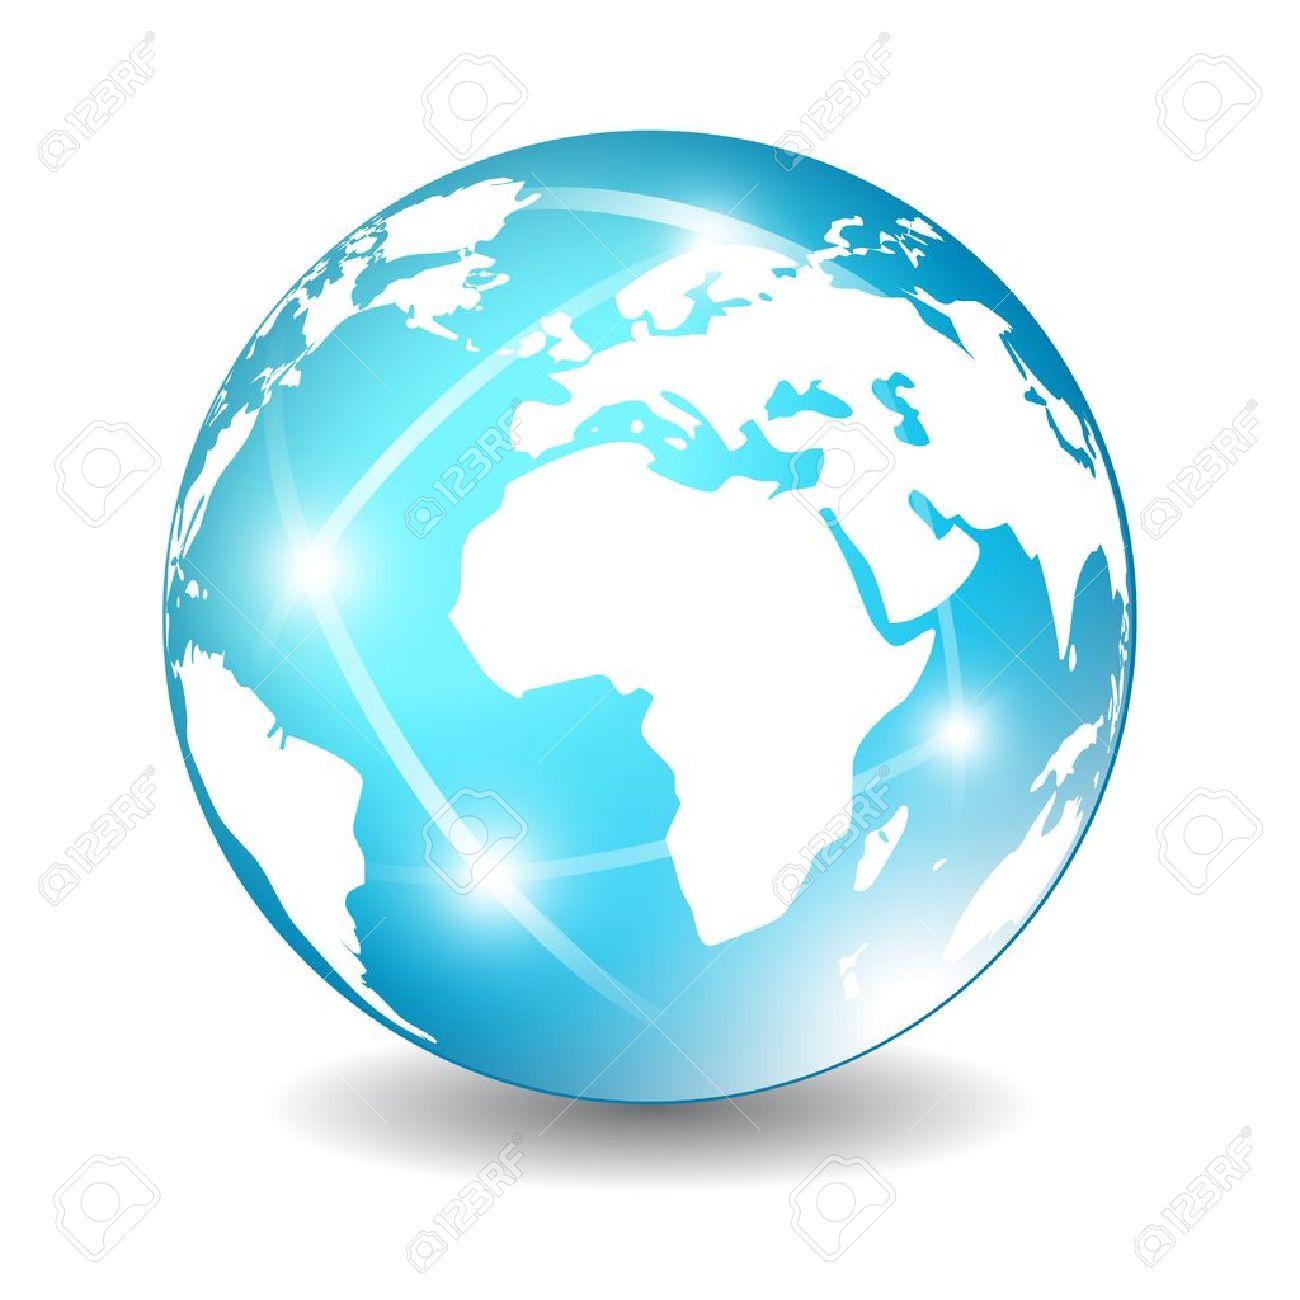 Earth globe icon, vector illustration - 19375856